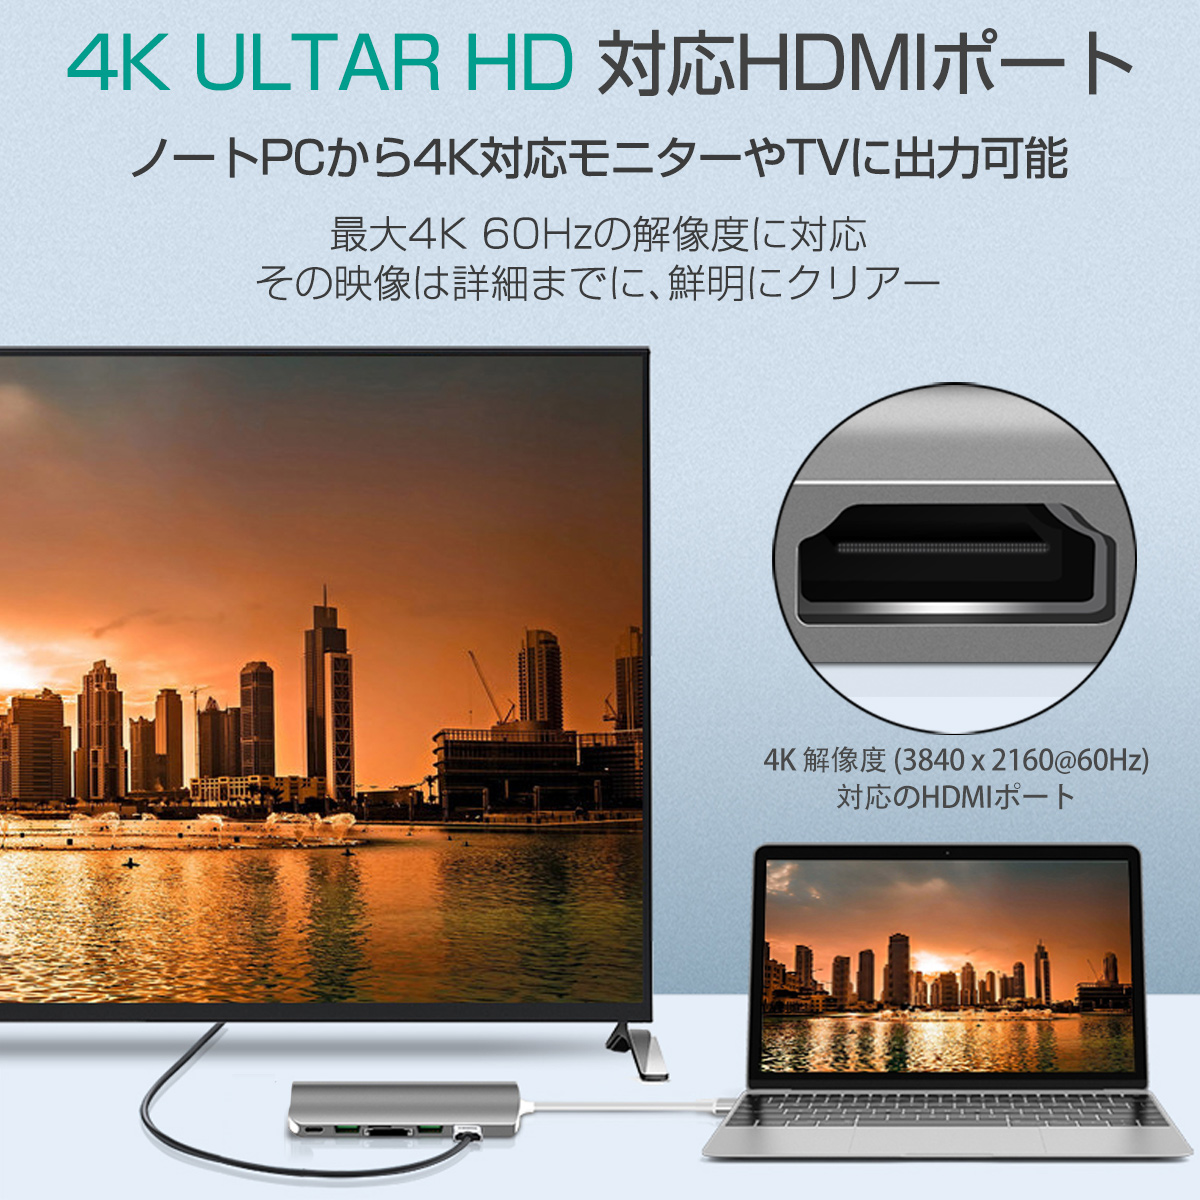 USB Type-C ハブ 7in1 USB3.0x2 4K HDMI 1Gbps有線LAN PD充電 microSD SDスロット 拡張 変換 スペースグレイ 軽量 Galaxy MacBook ChromeBook VAIO Mac Windows対応 3ヶ月保証